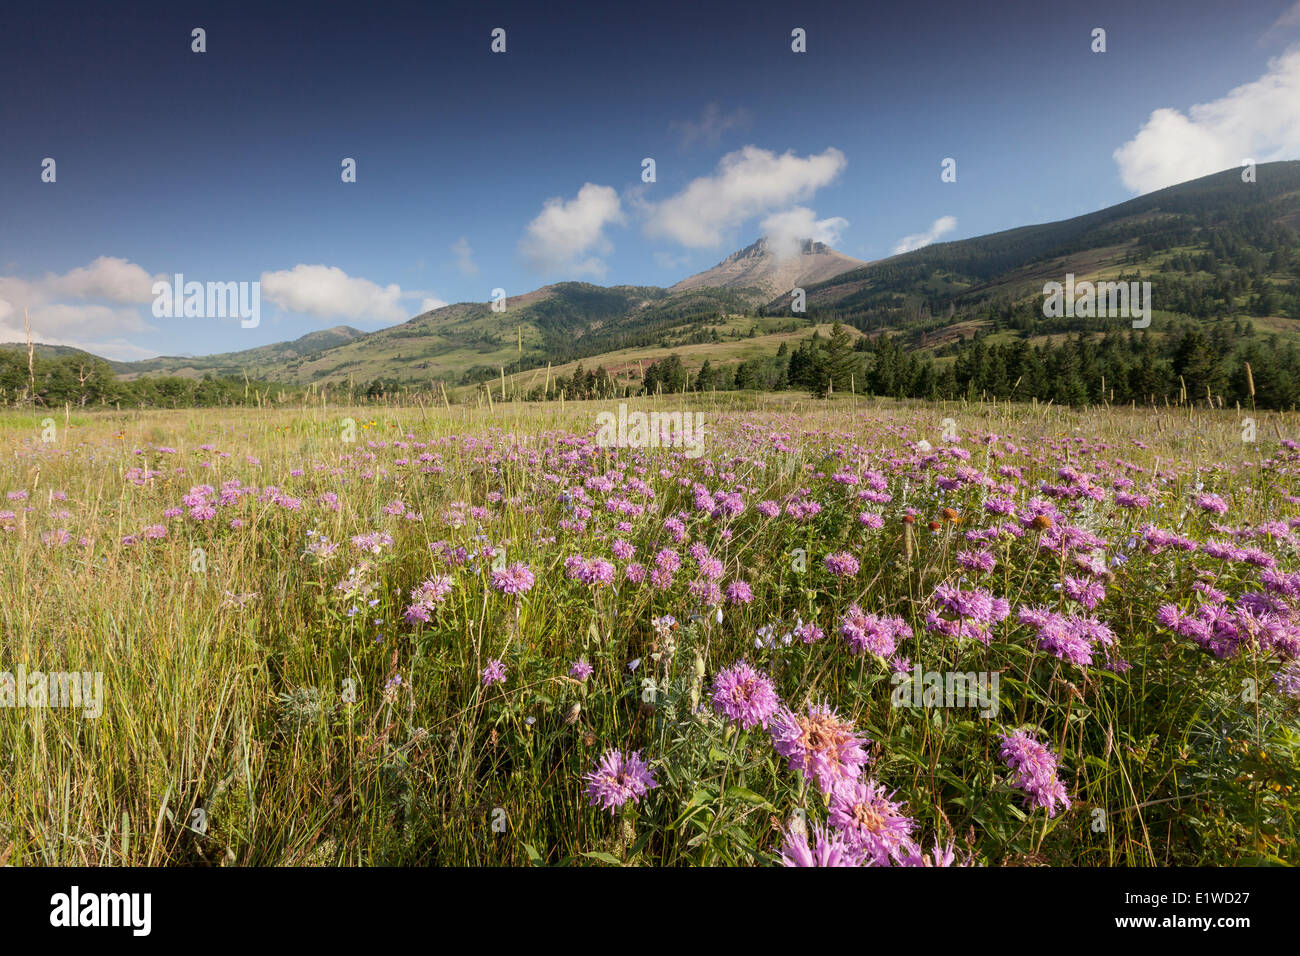 Wild Bergamot (Monarda fistulosa) other native wildflowers with a mountain backdrop in Waterton Lakes National Park - Stock Image